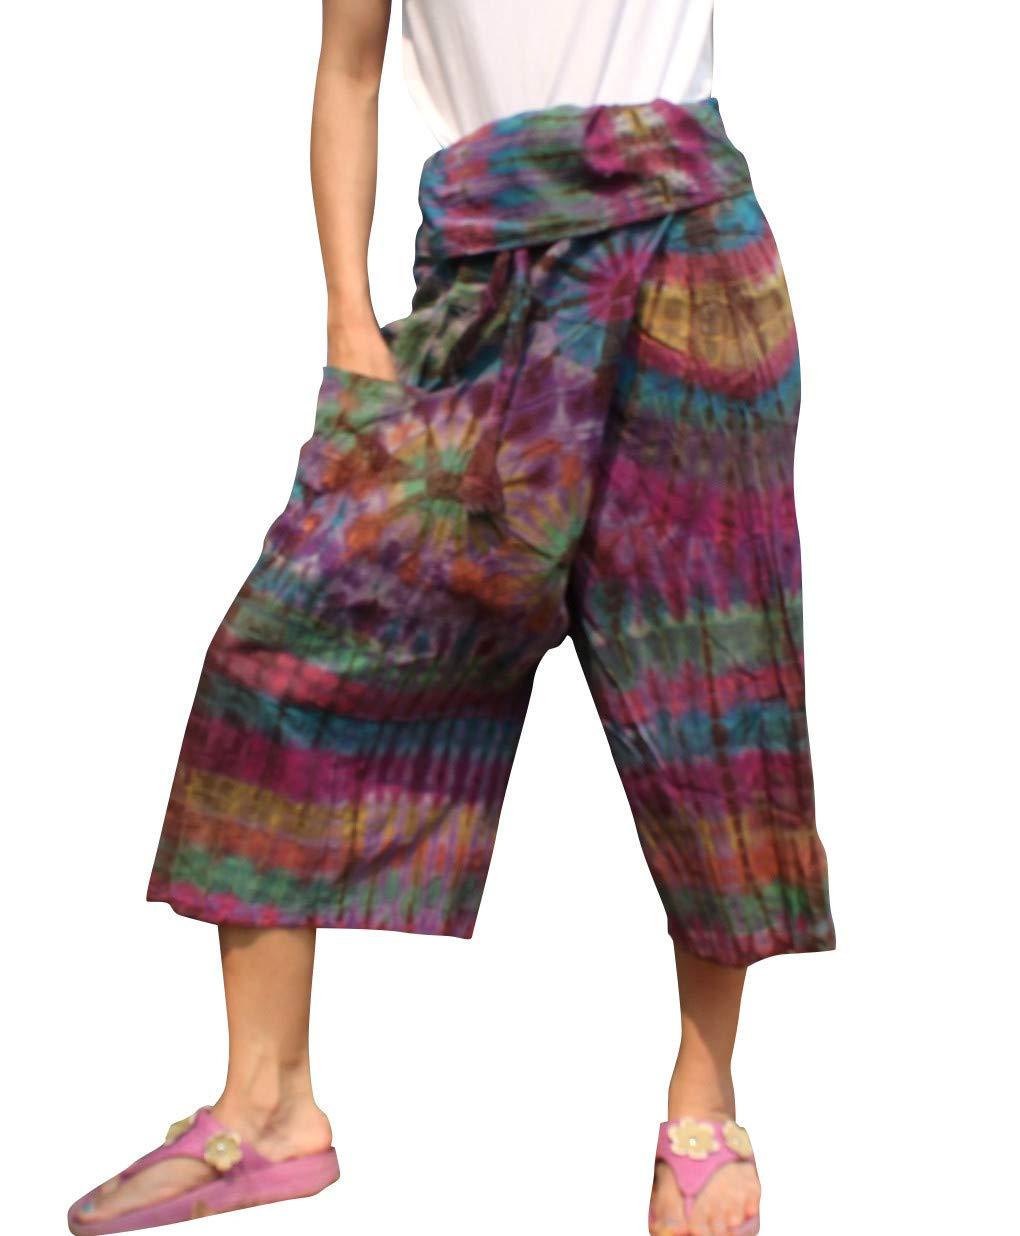 Full Funk Cotton Tie Dyed Natural Colorful Thai Fisherman Wrap 3/4 Leg Pants, Medium, English Violet by Full Funk